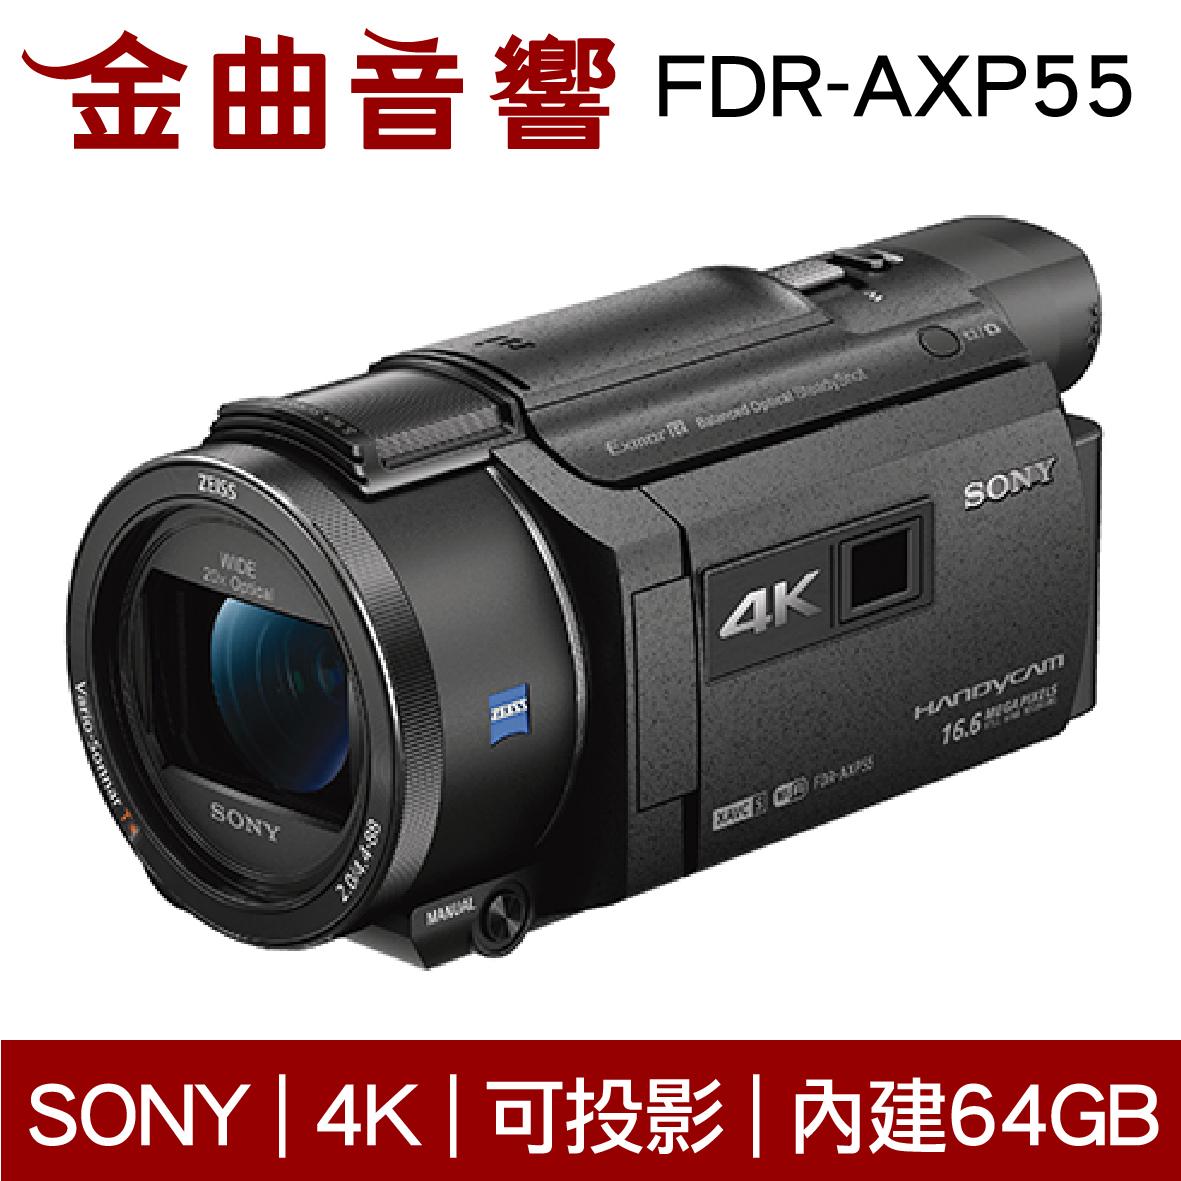 SONY 索尼 FDR-AXP55 4K 高畫質 數位 攝影機 可投影 內建64GB   金曲音響。人氣店家金曲音響的有最棒的商品。快到日本NO.1的Rakuten樂天市場的安全環境中盡情網路購物,使